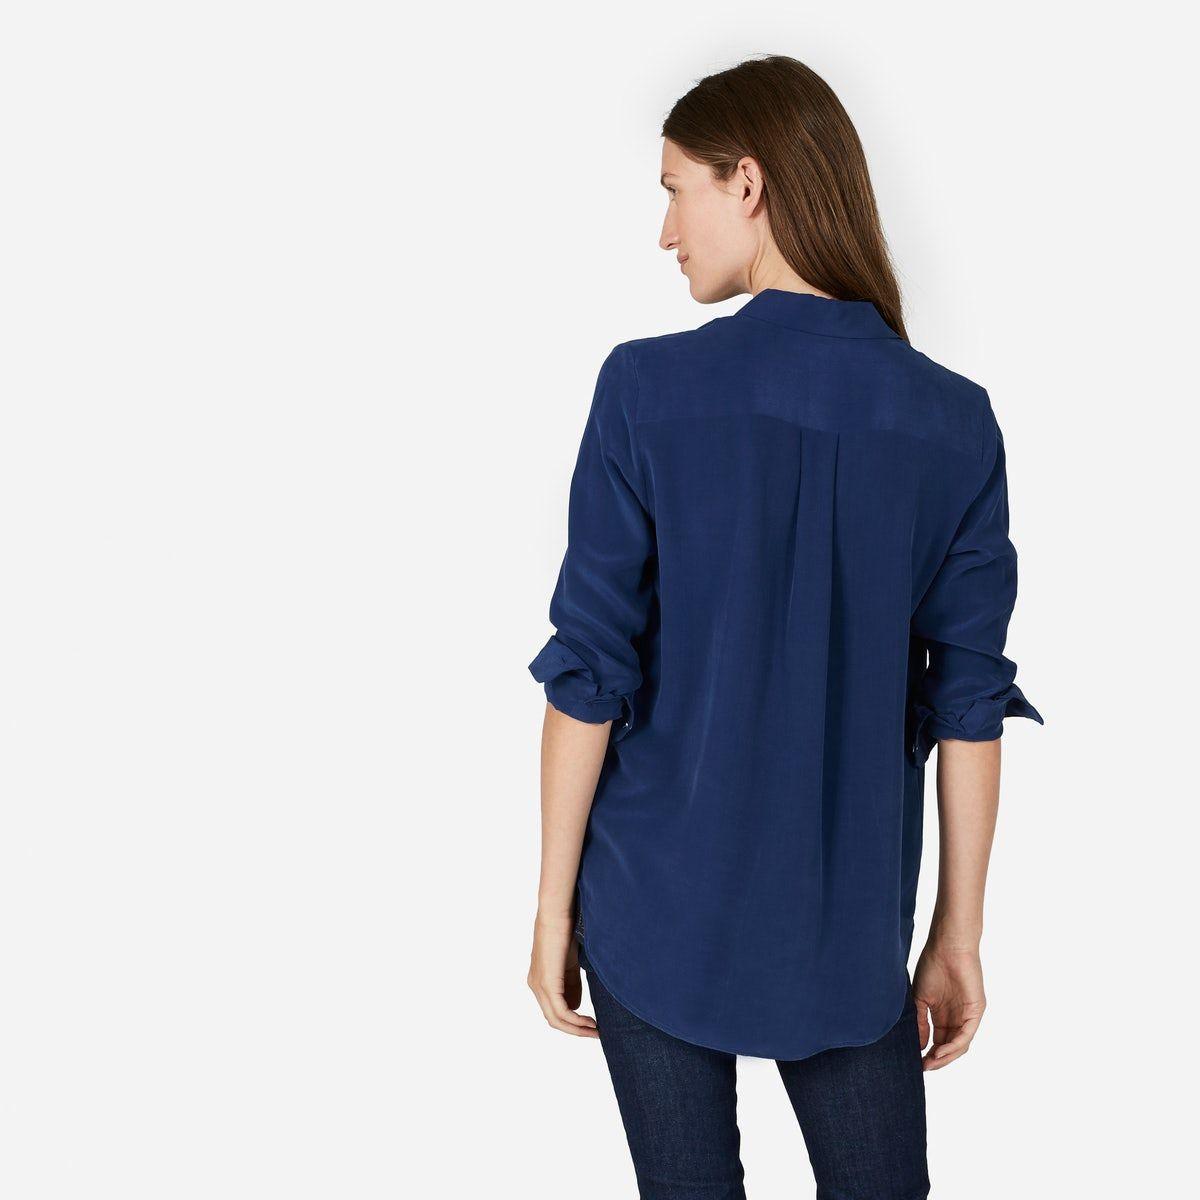 4616fdb302c77 Royal Blue Silk Shirt Womens